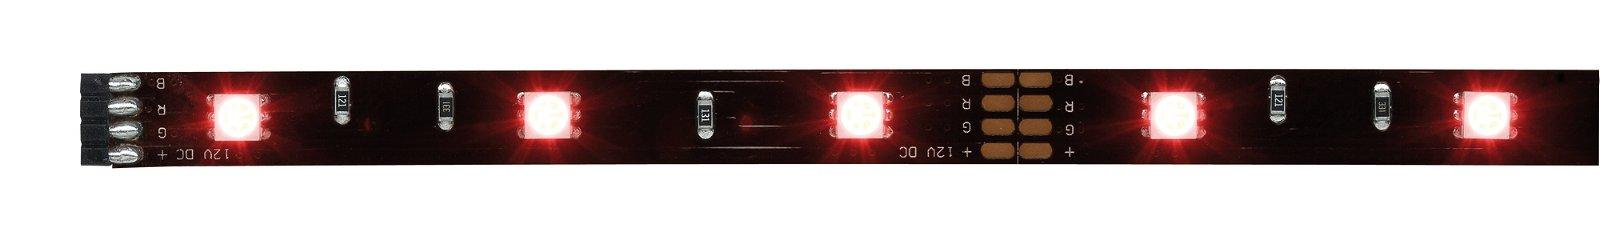 YourLED ECO LED Strip RGB 0,5m 3W 110lm/m RGB